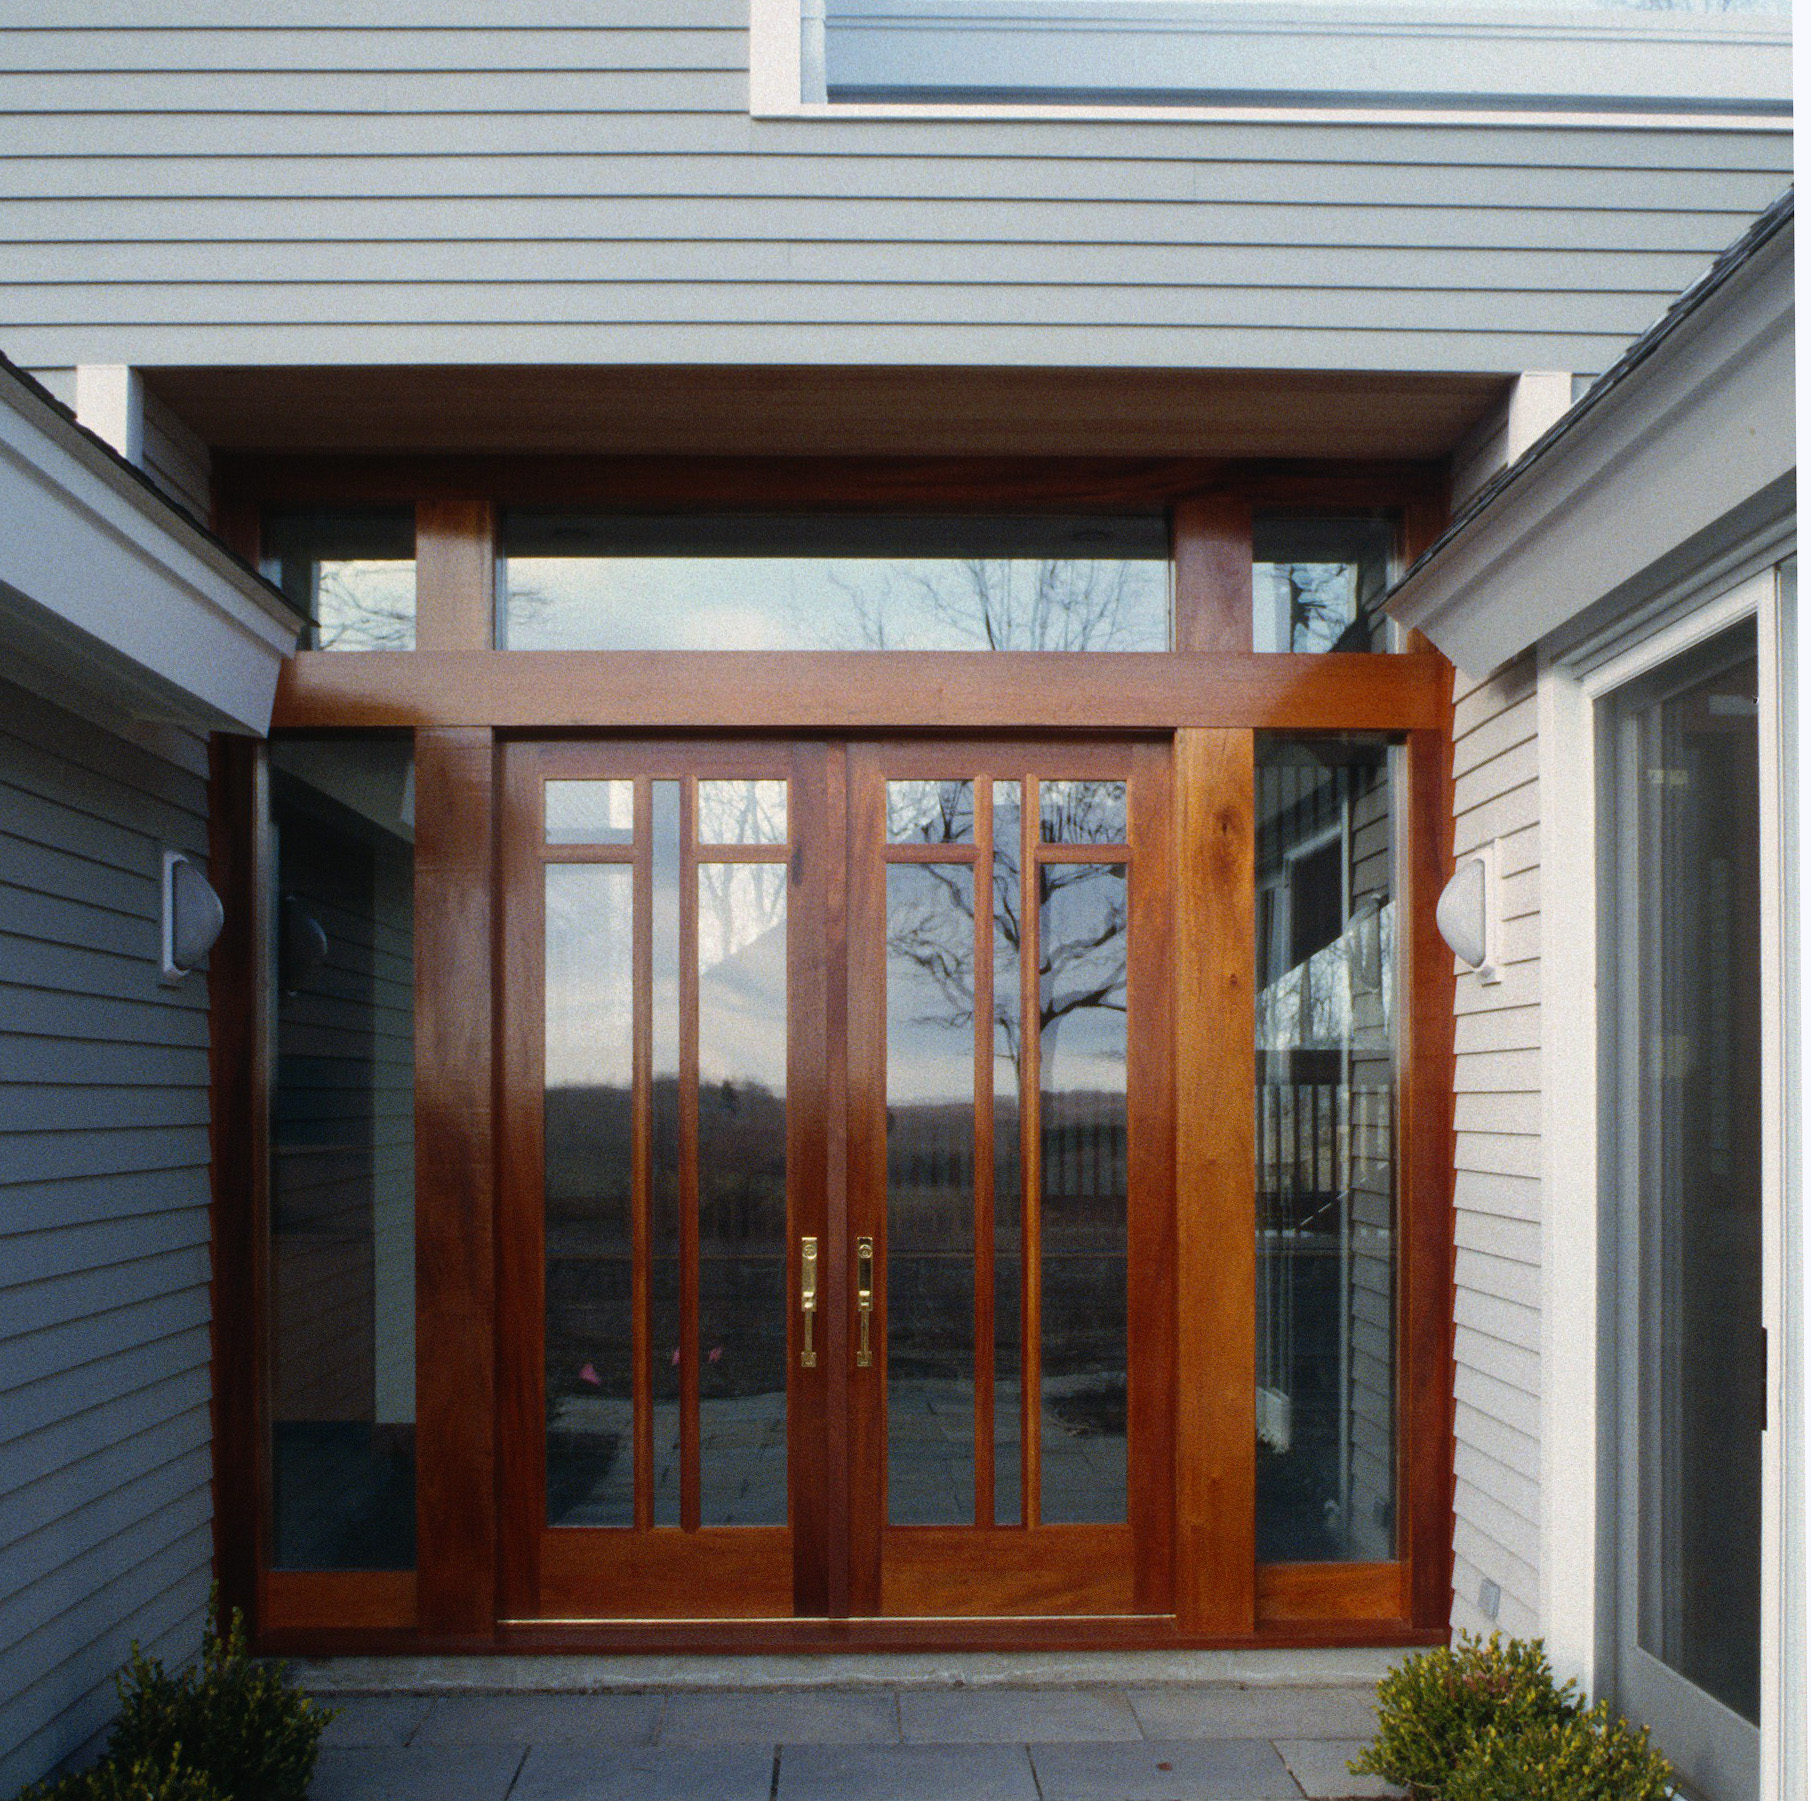 e Exterior Entry.jpg